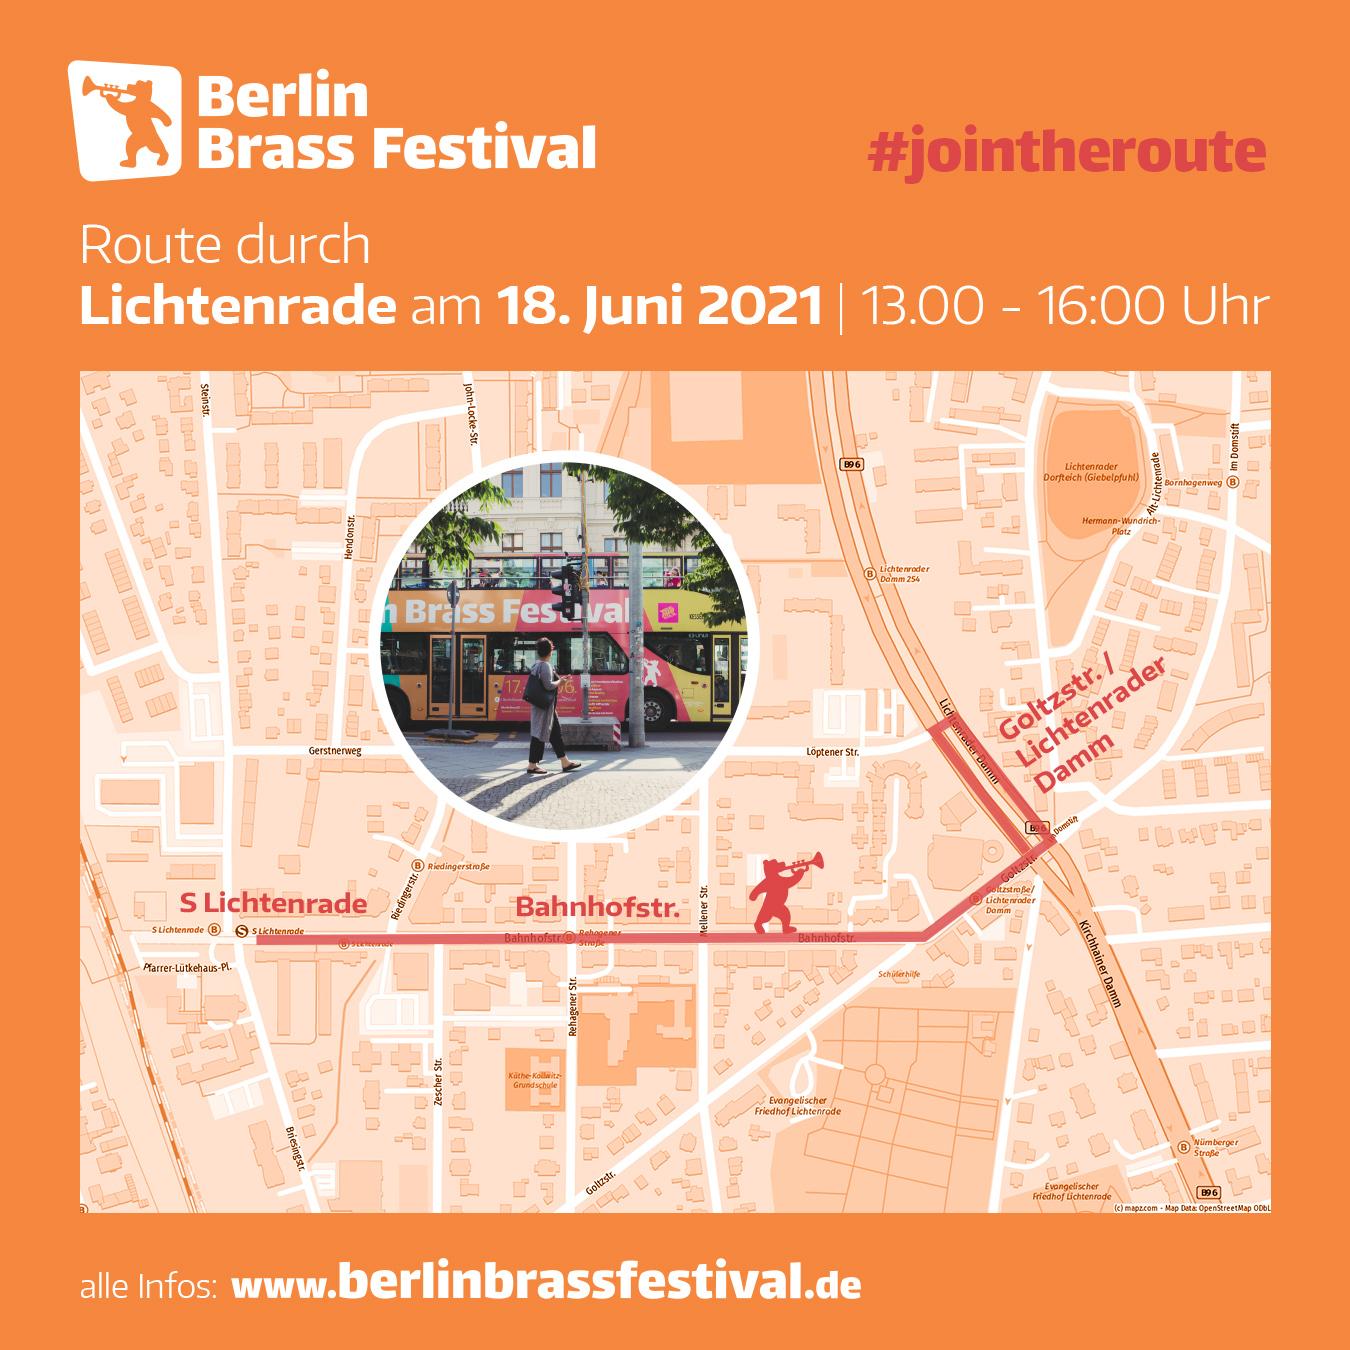 Berlin Brass Festival 2021 Route Lichtenrade